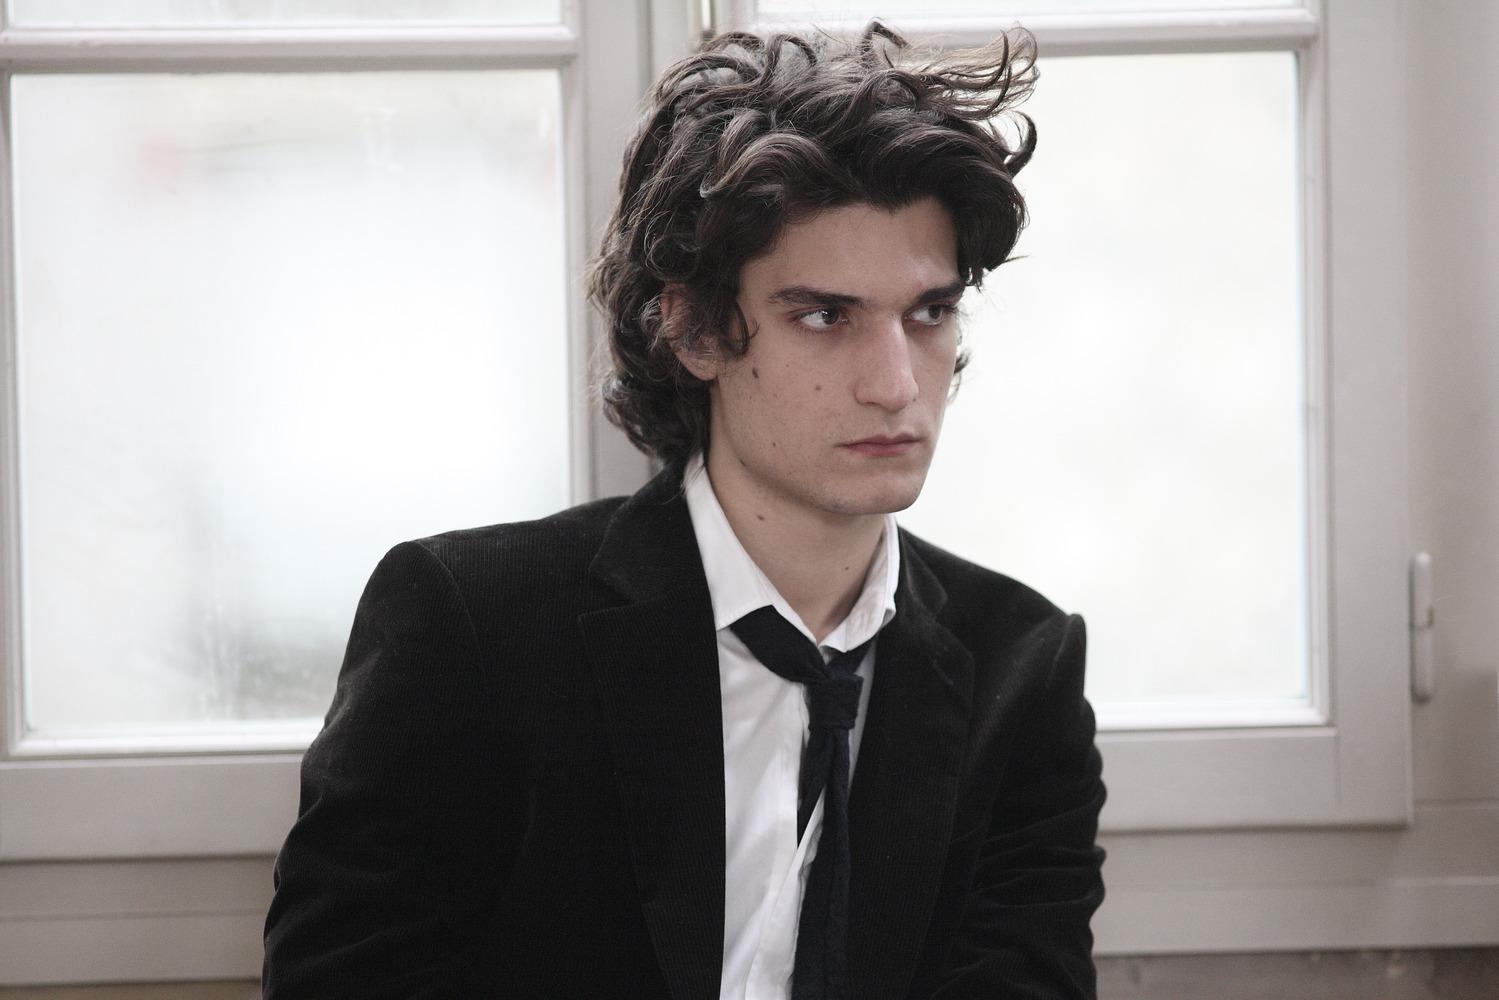 Луи Гаррель - классический красавец-француз